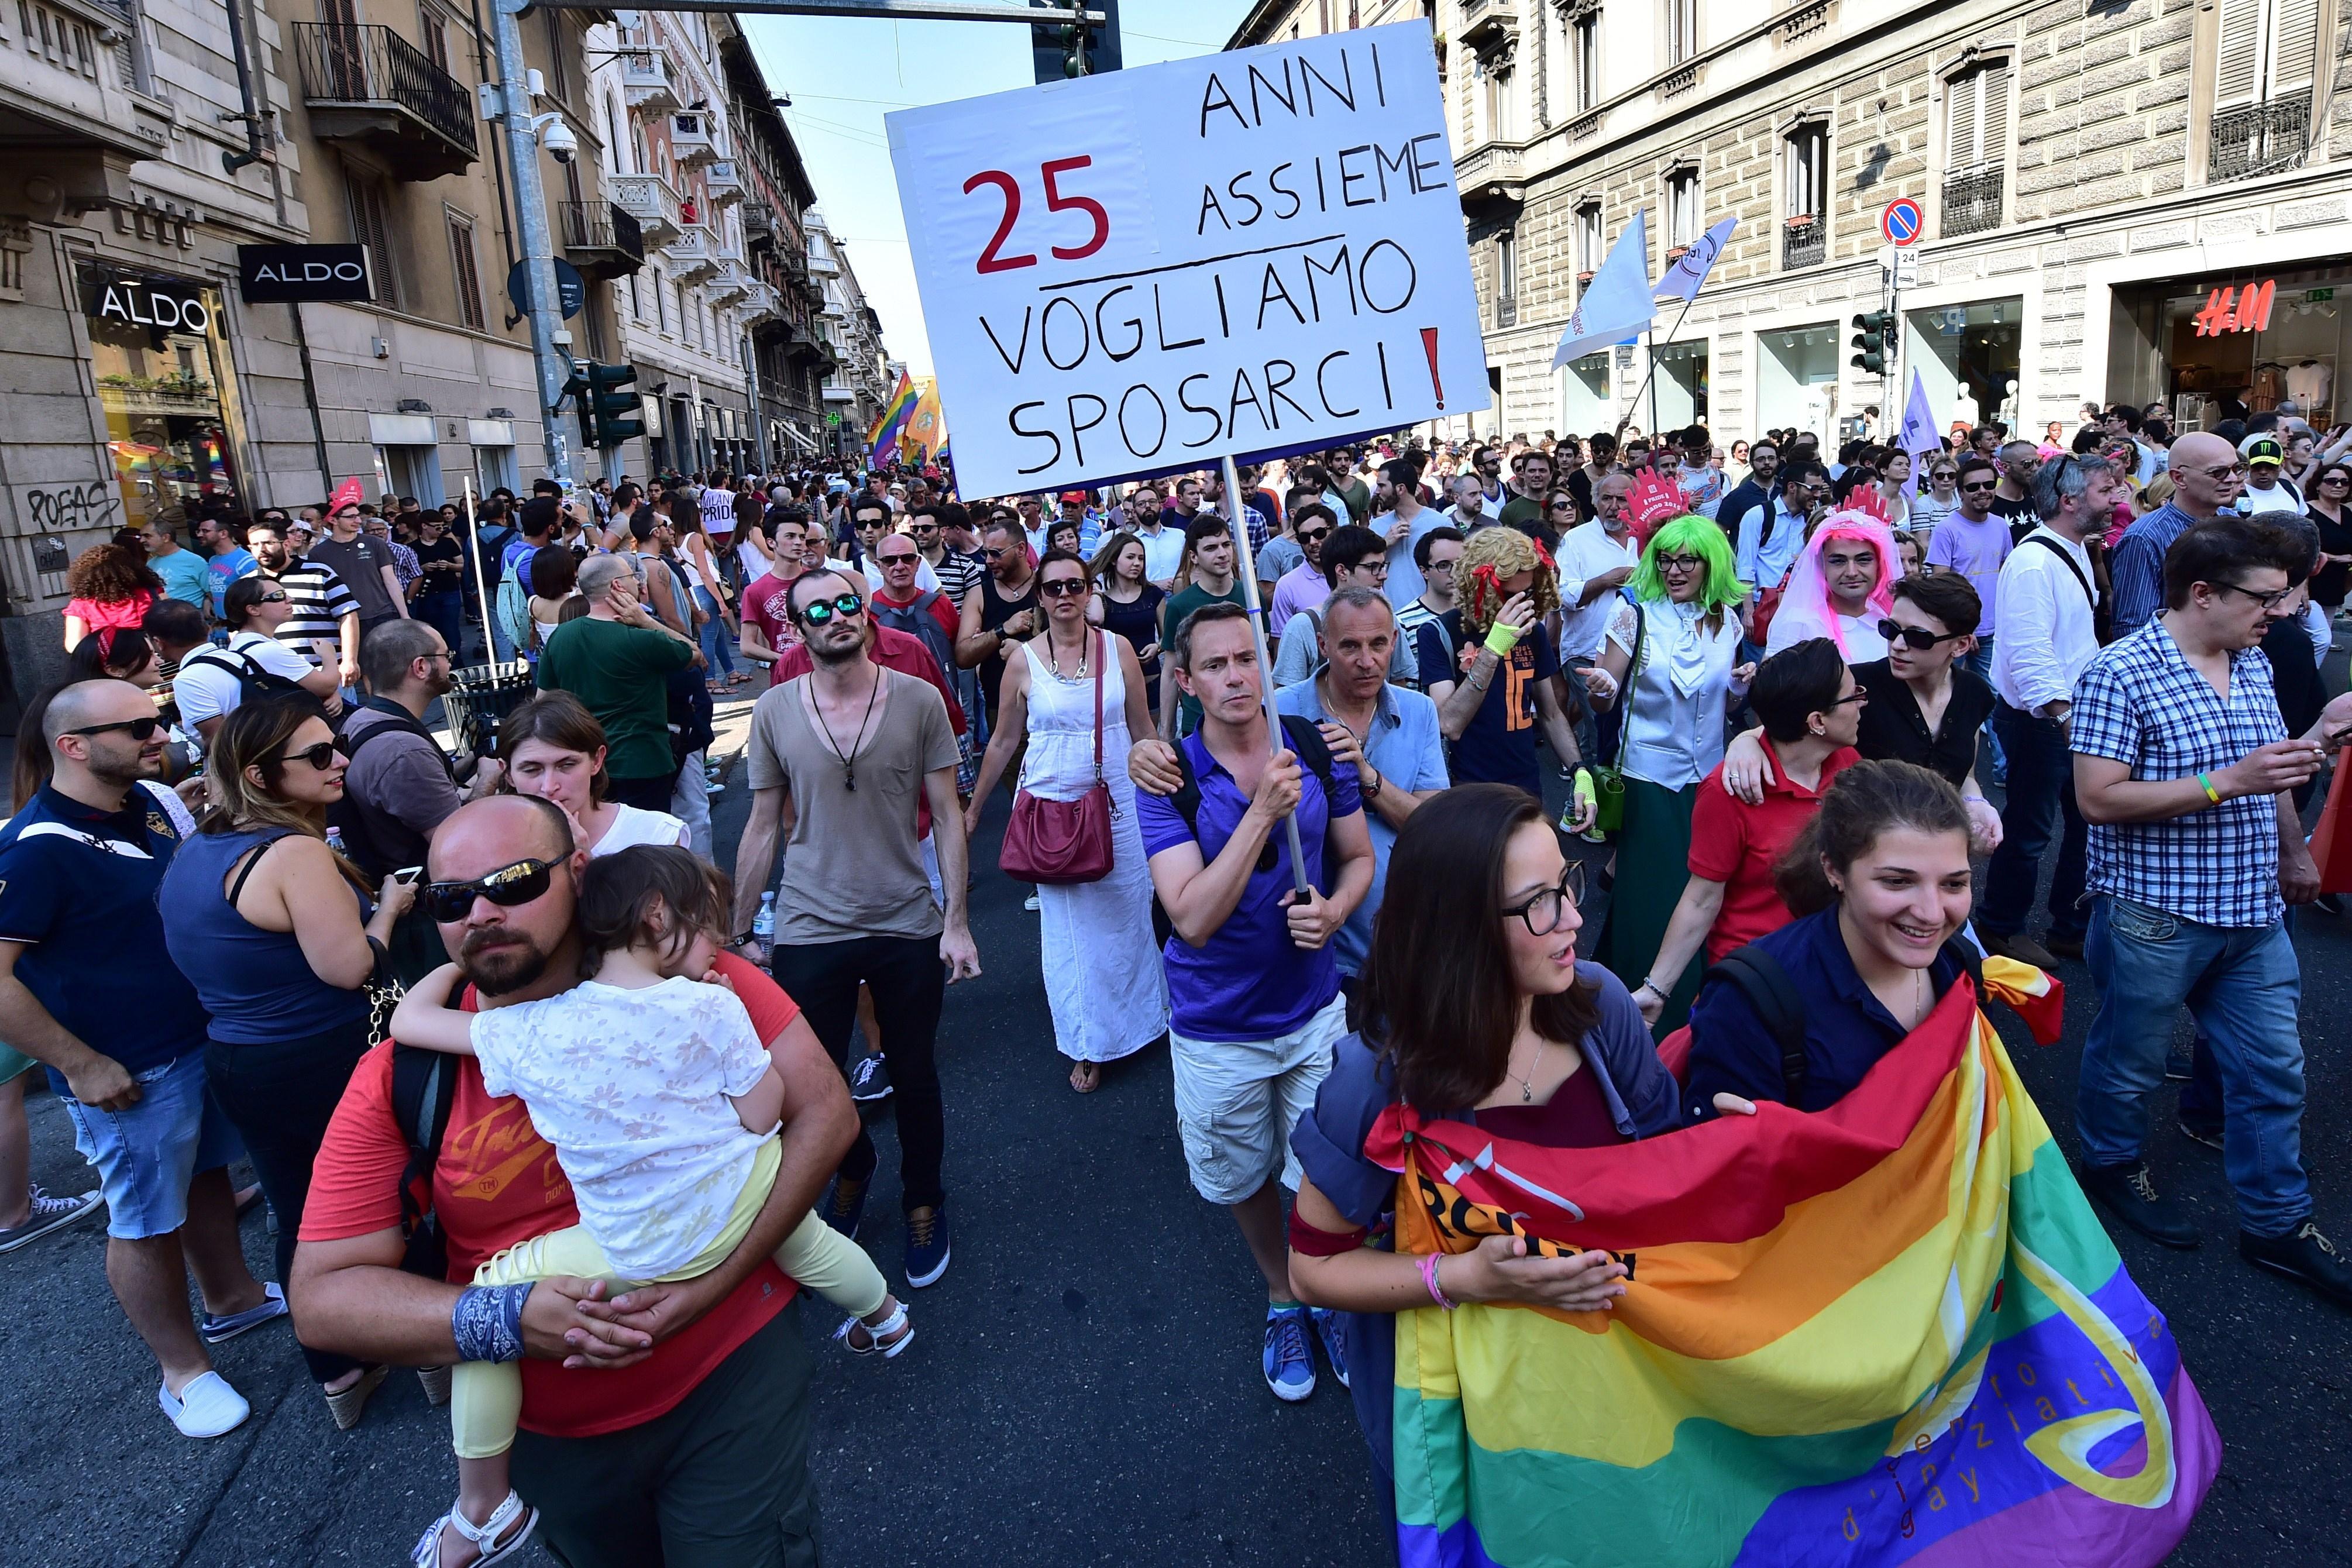 Poland hosts major european gay rights rally